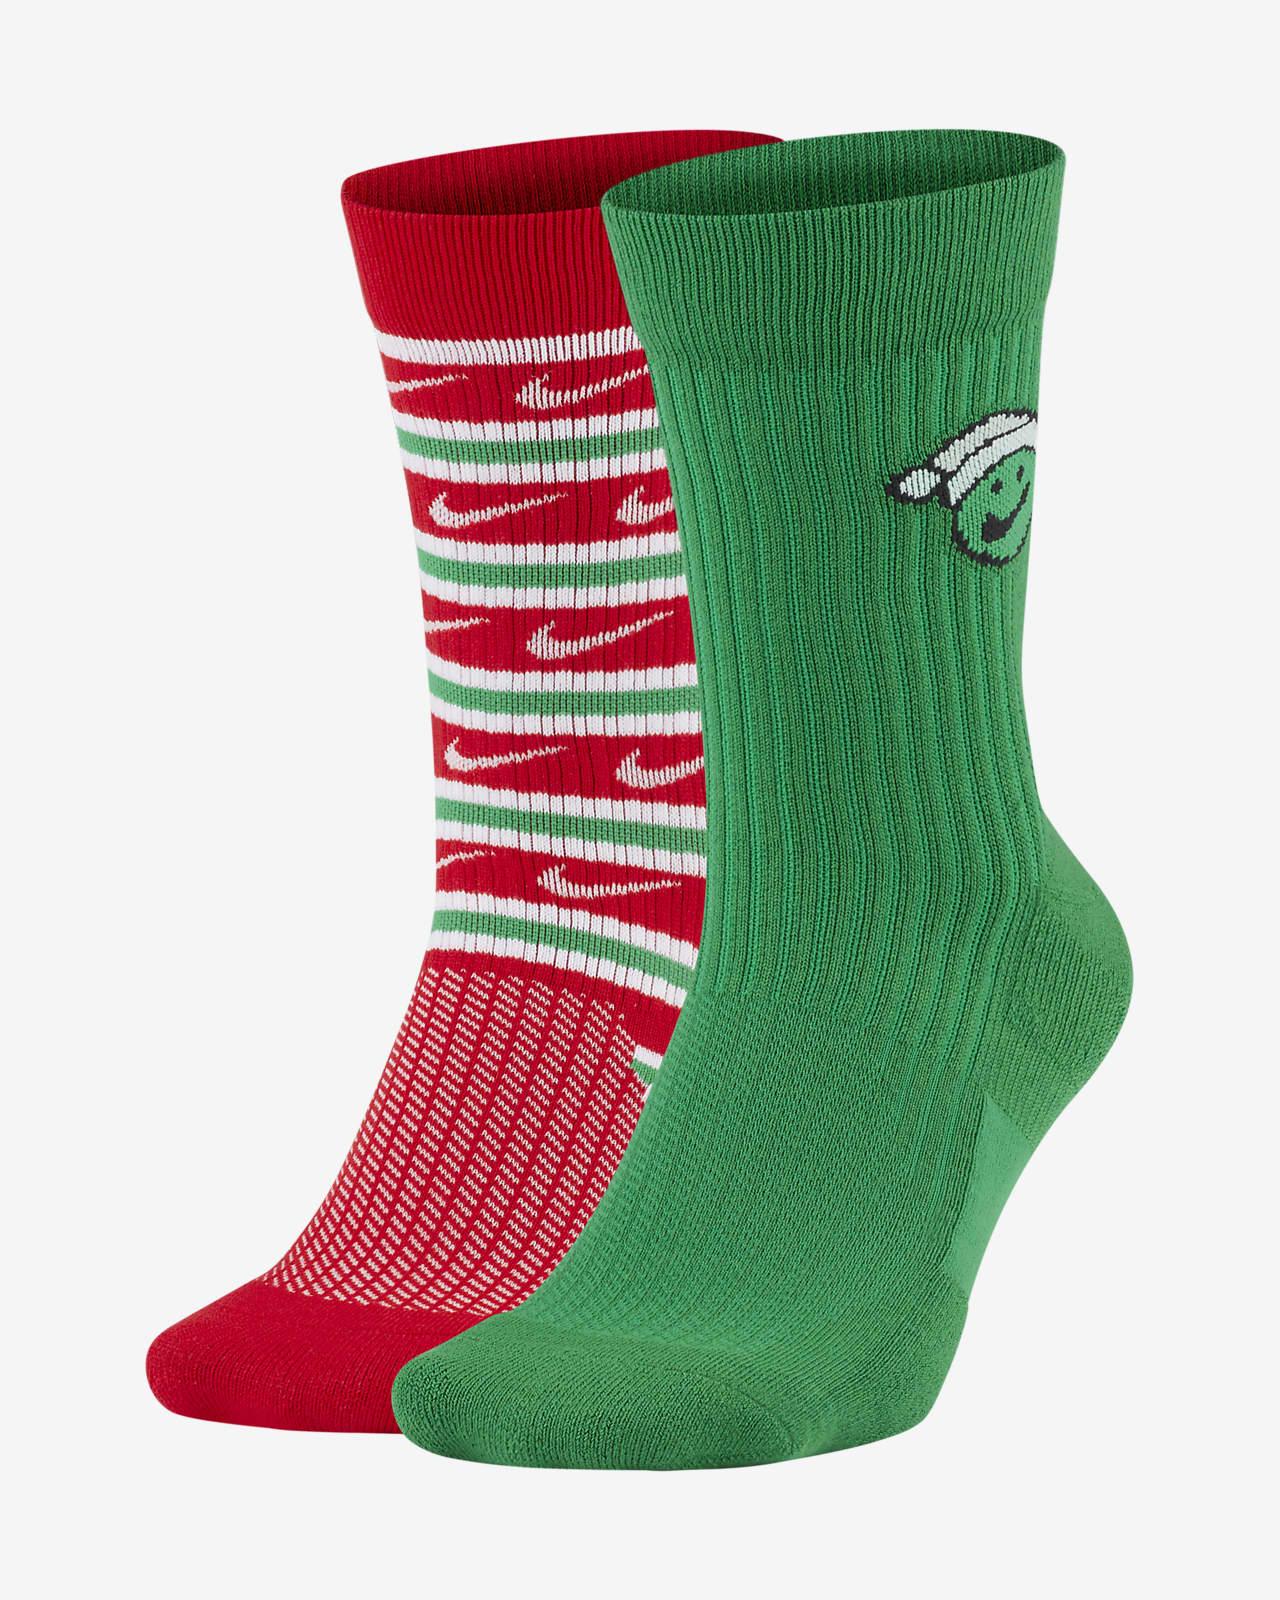 Nike SNKR Sox Crew Socks (2 Pairs)